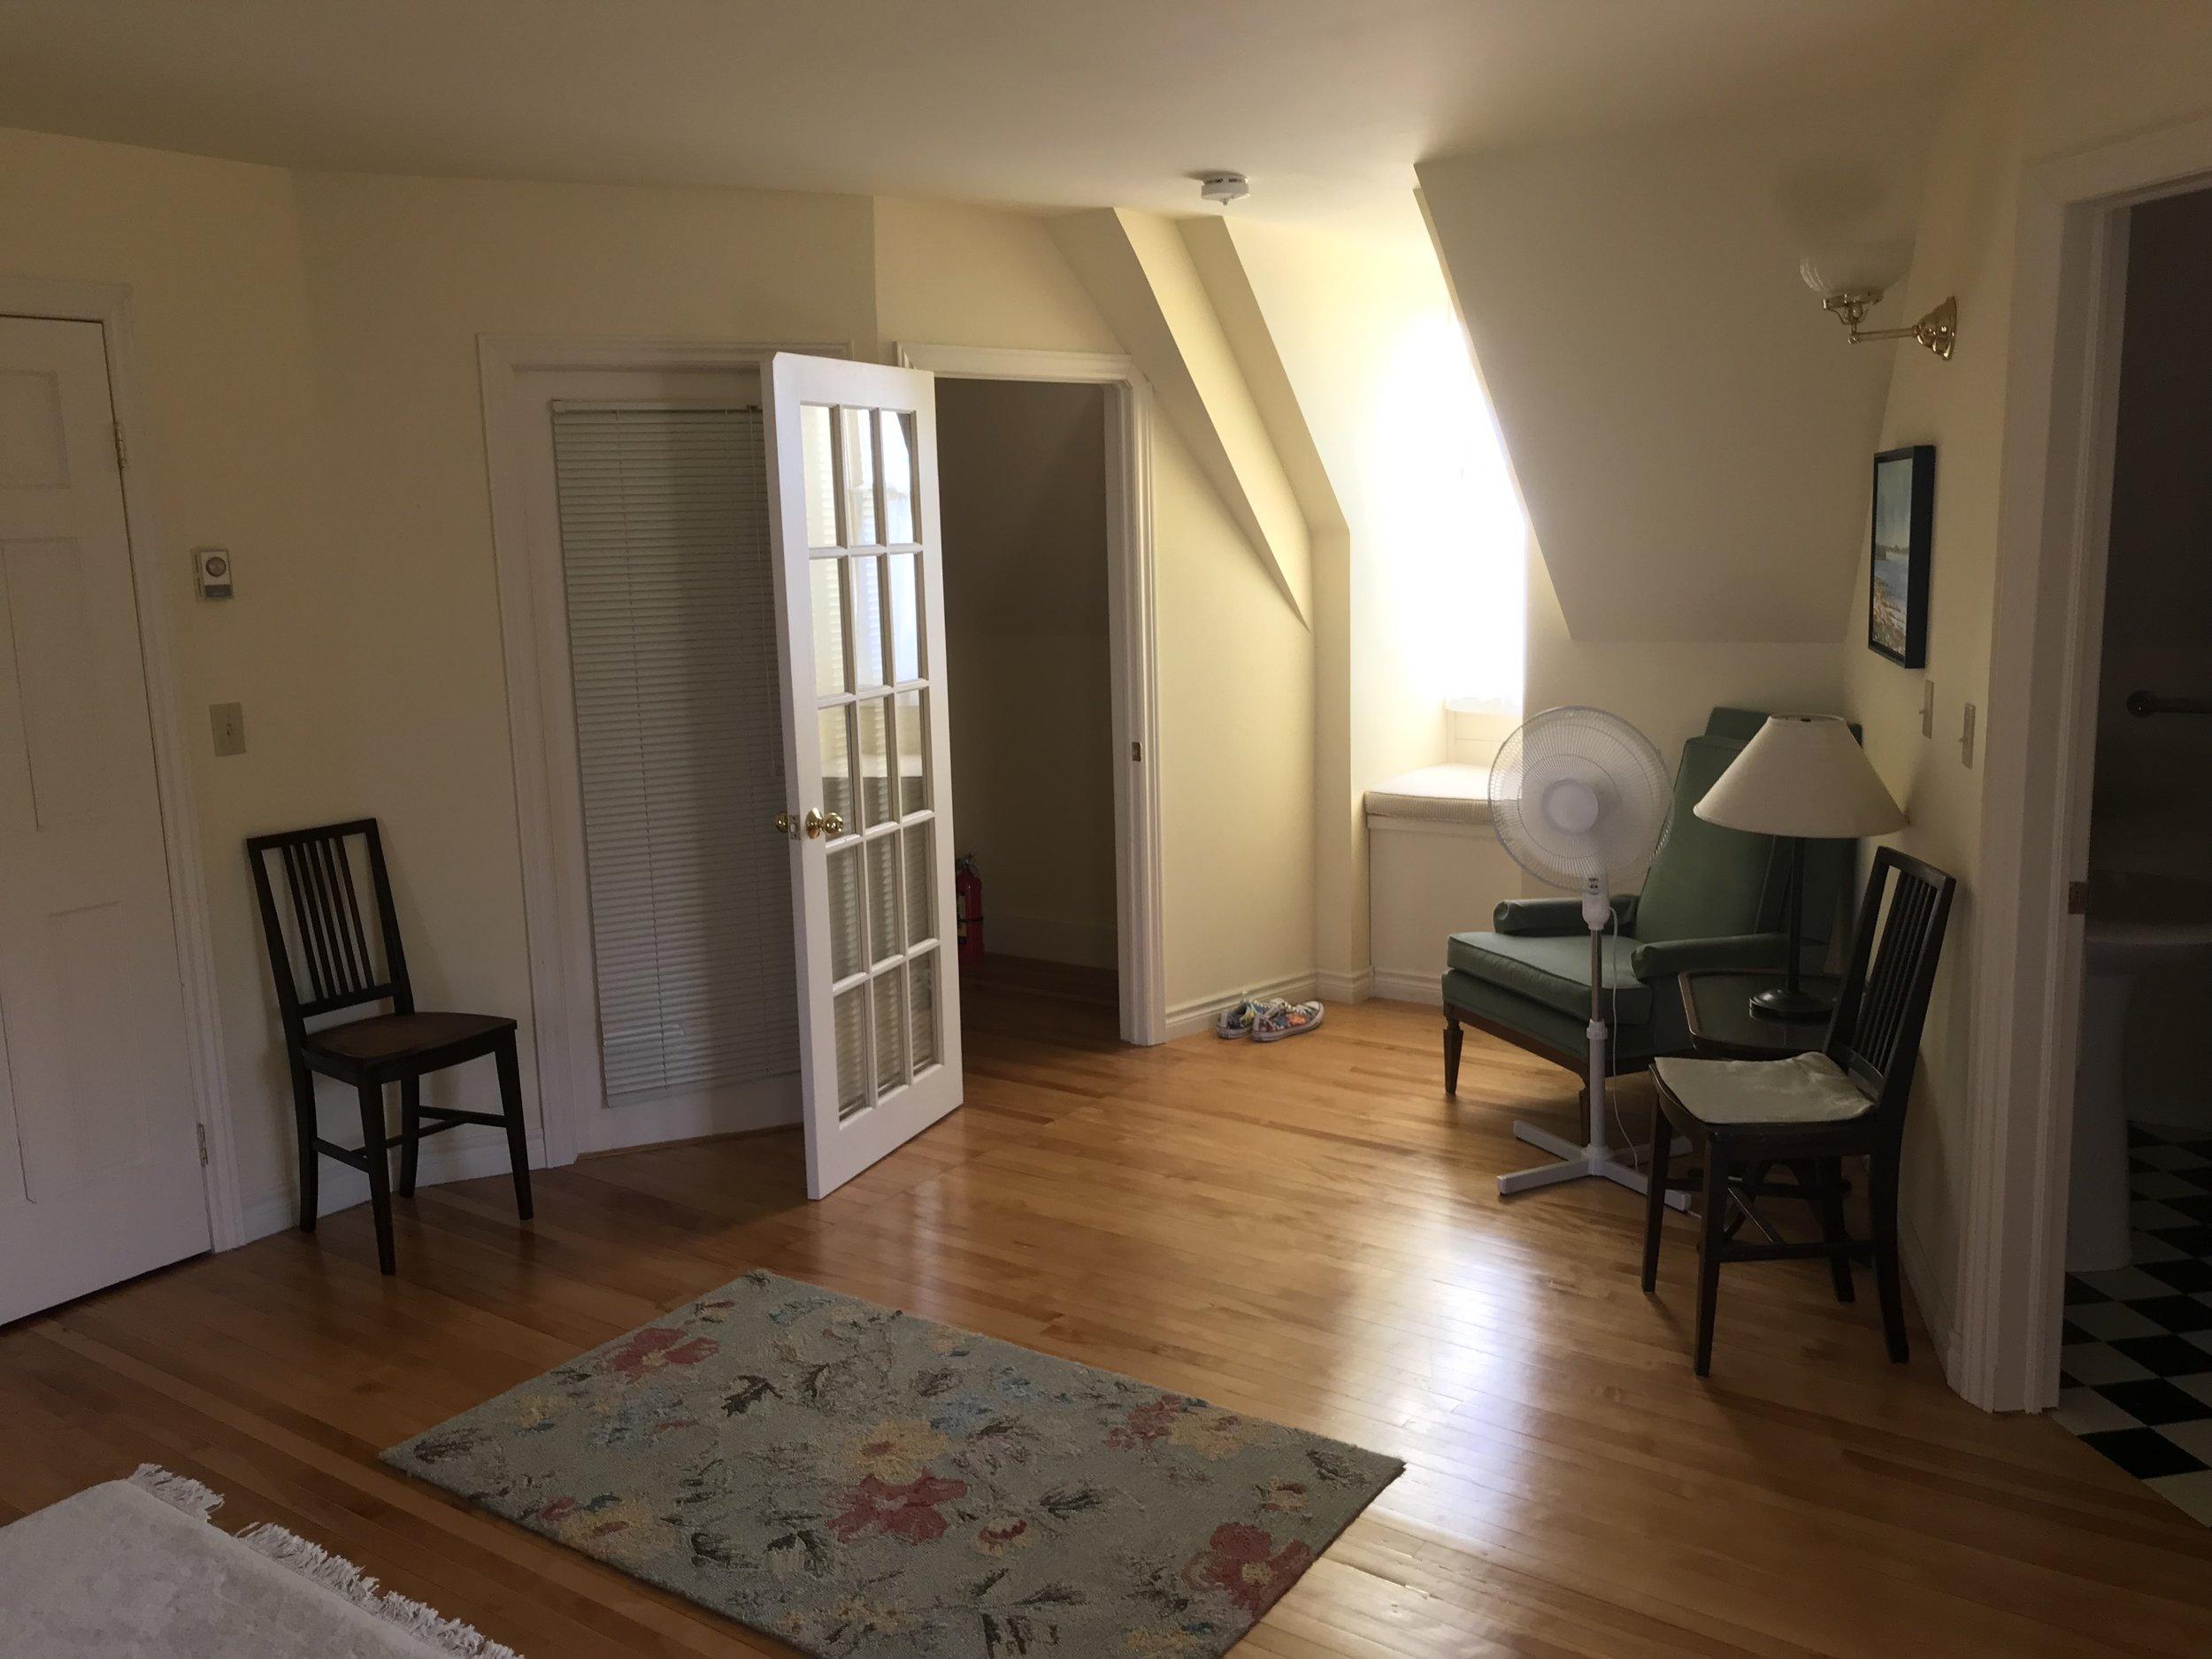 Doorway to Stairs